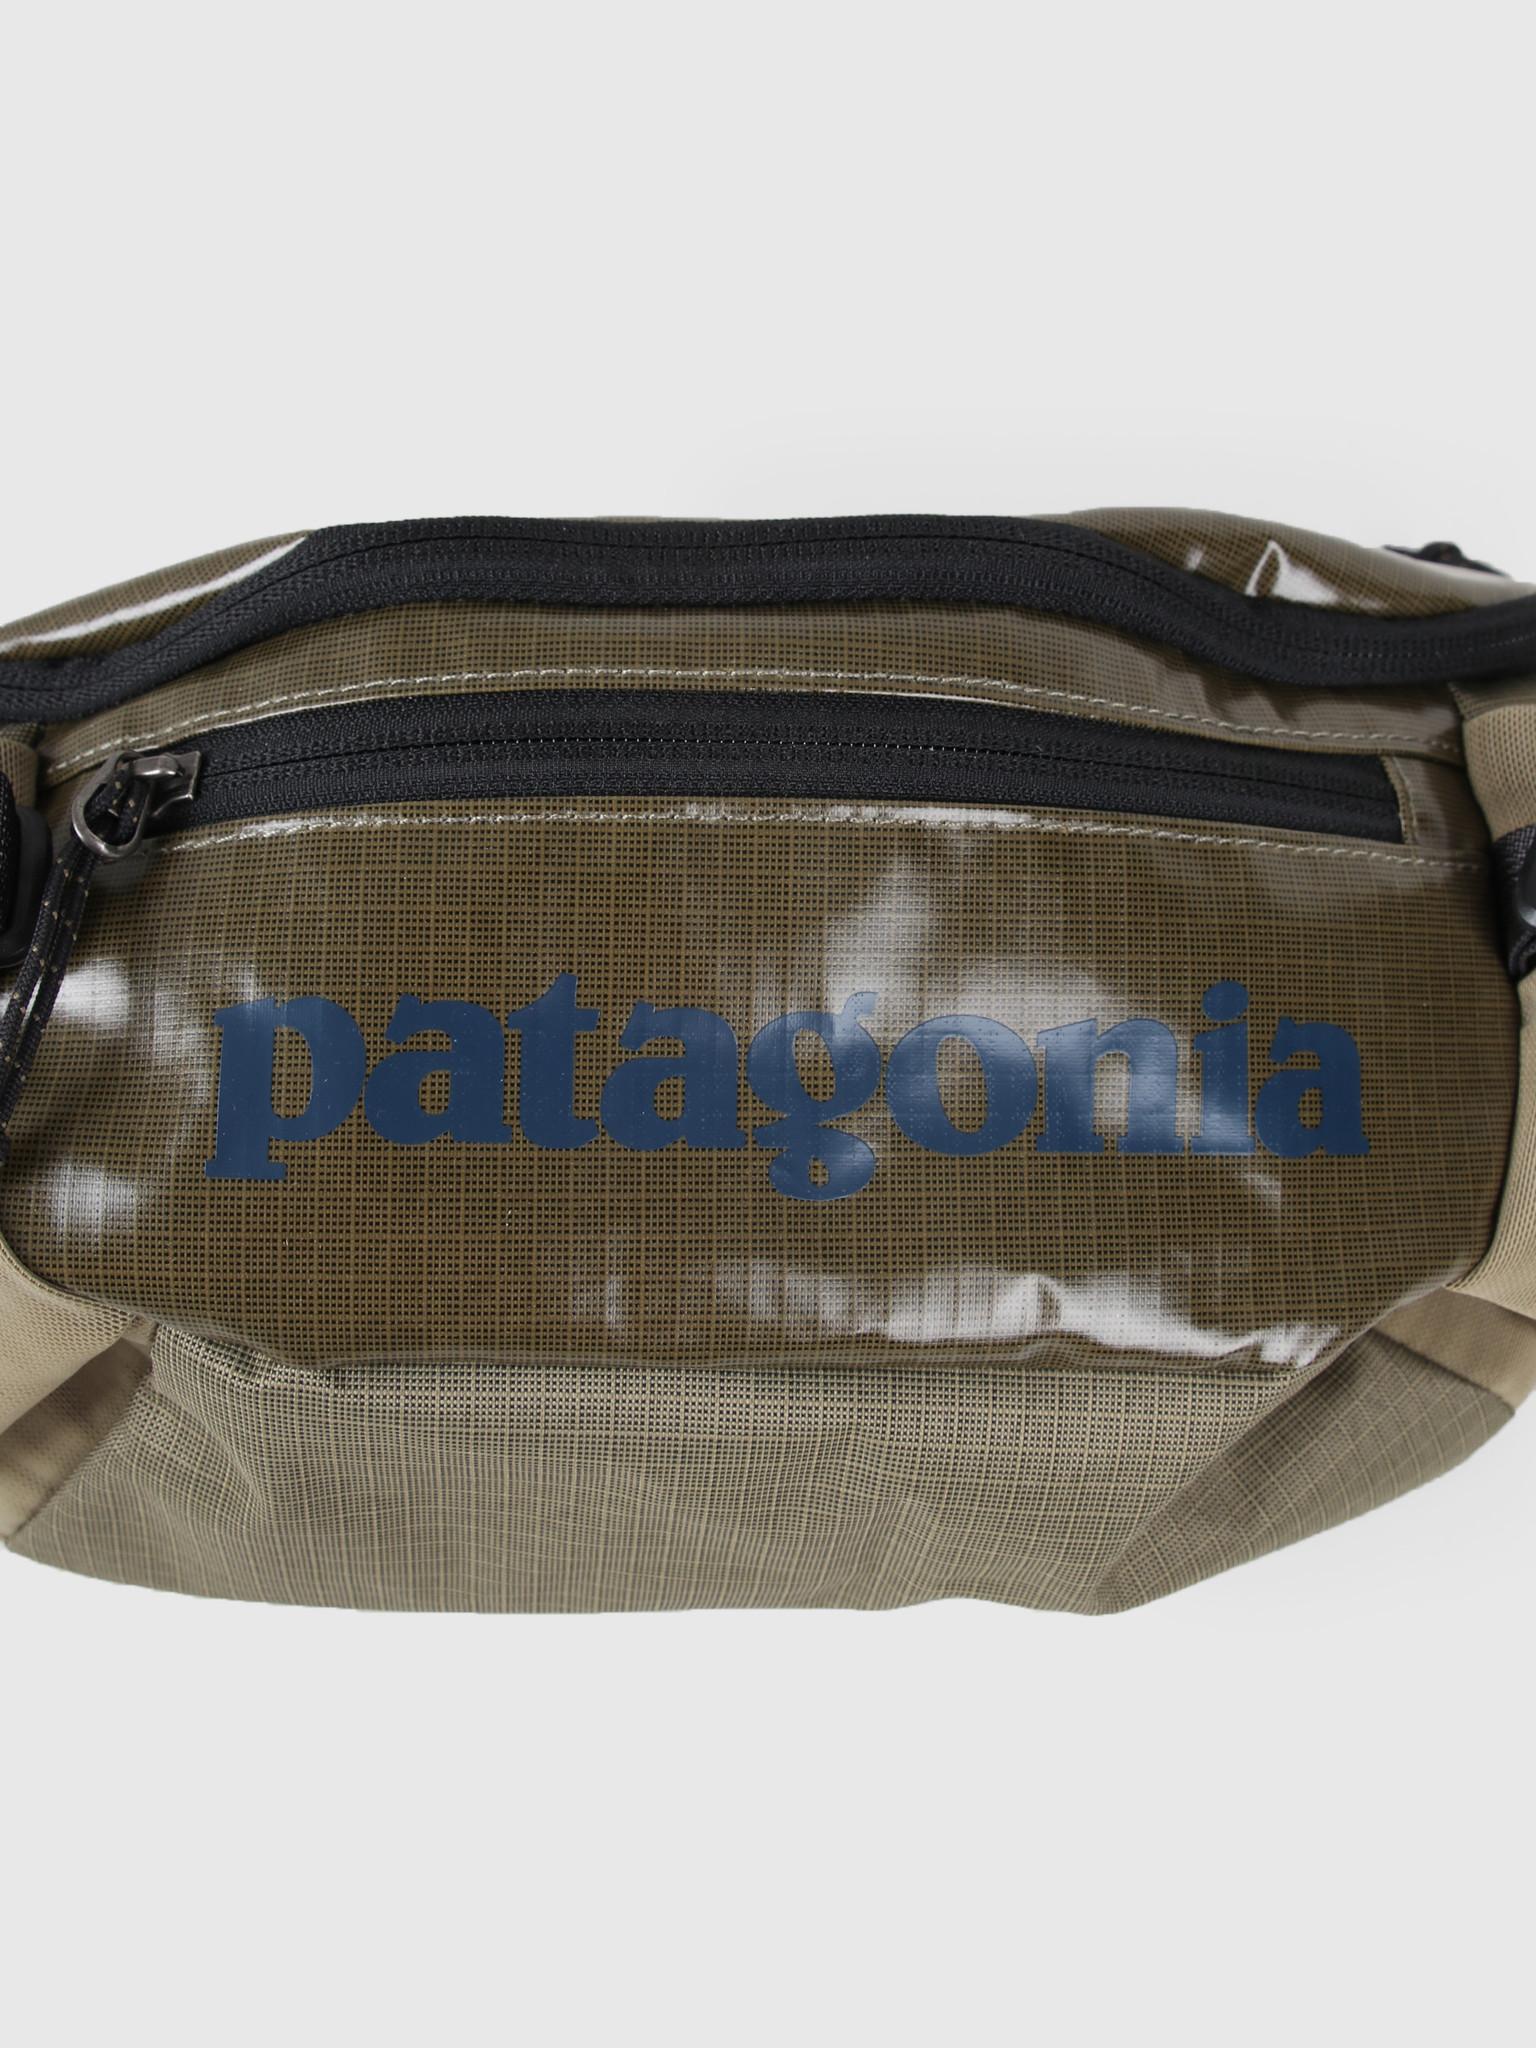 Patagonia Patagonia Black Hole Waist Pack 5L Sage Khaki 49281